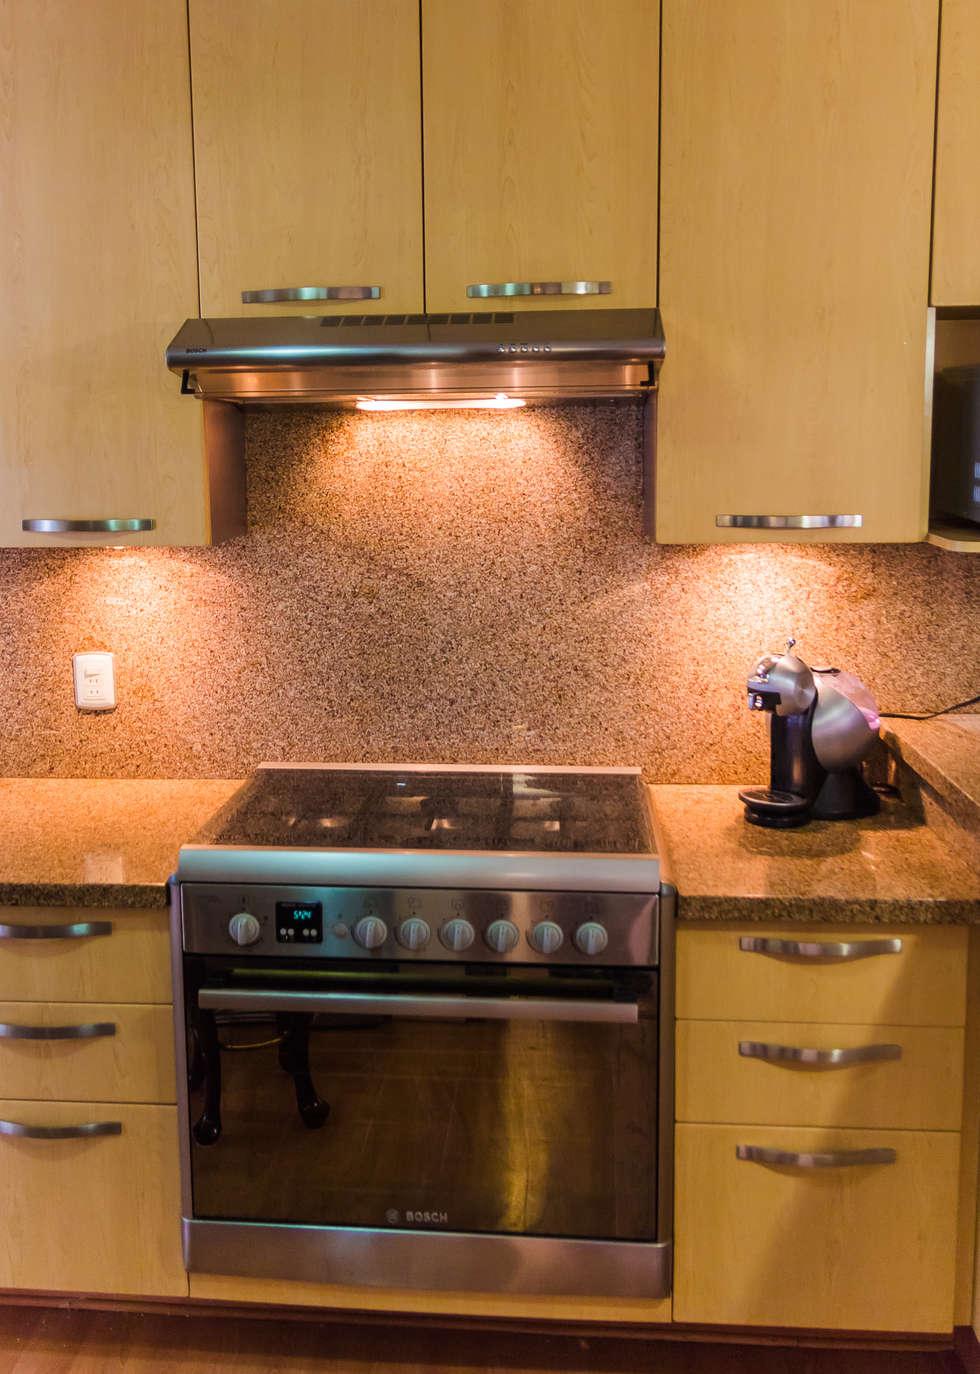 El granito como detalle: Cocinas de estilo moderno por Mikkael Kreis Architects